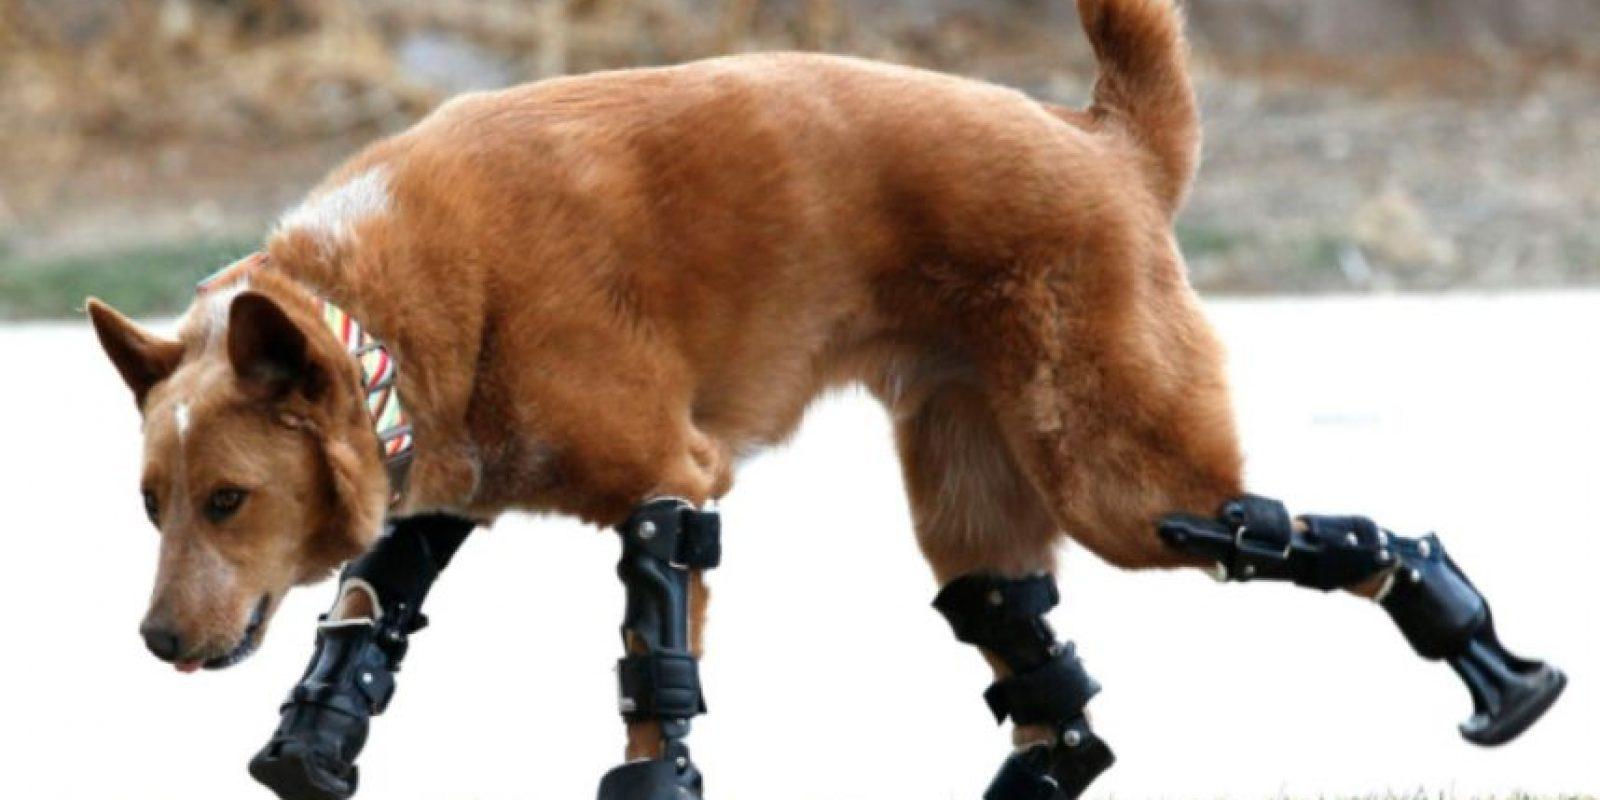 Ortopedia para mascotas Foto:Tumblr.com/Tagged-perros-sorprendentes